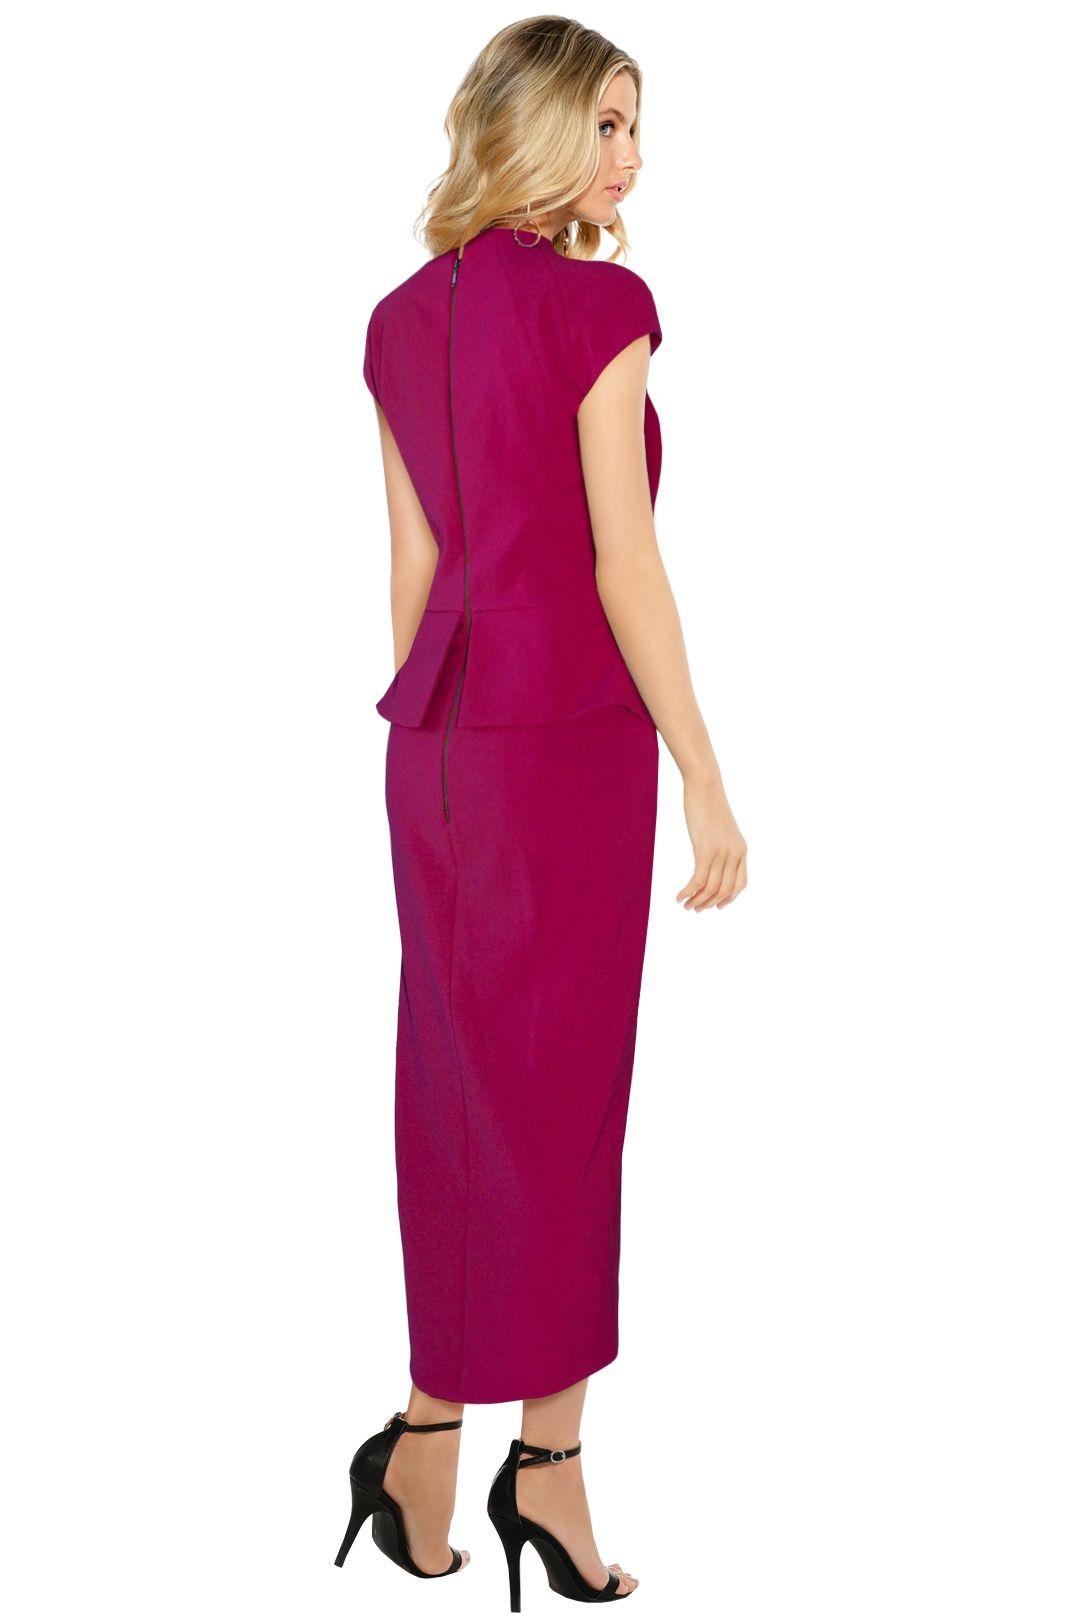 Aurelio Costarella - Cubiste Dress - Berry - Back